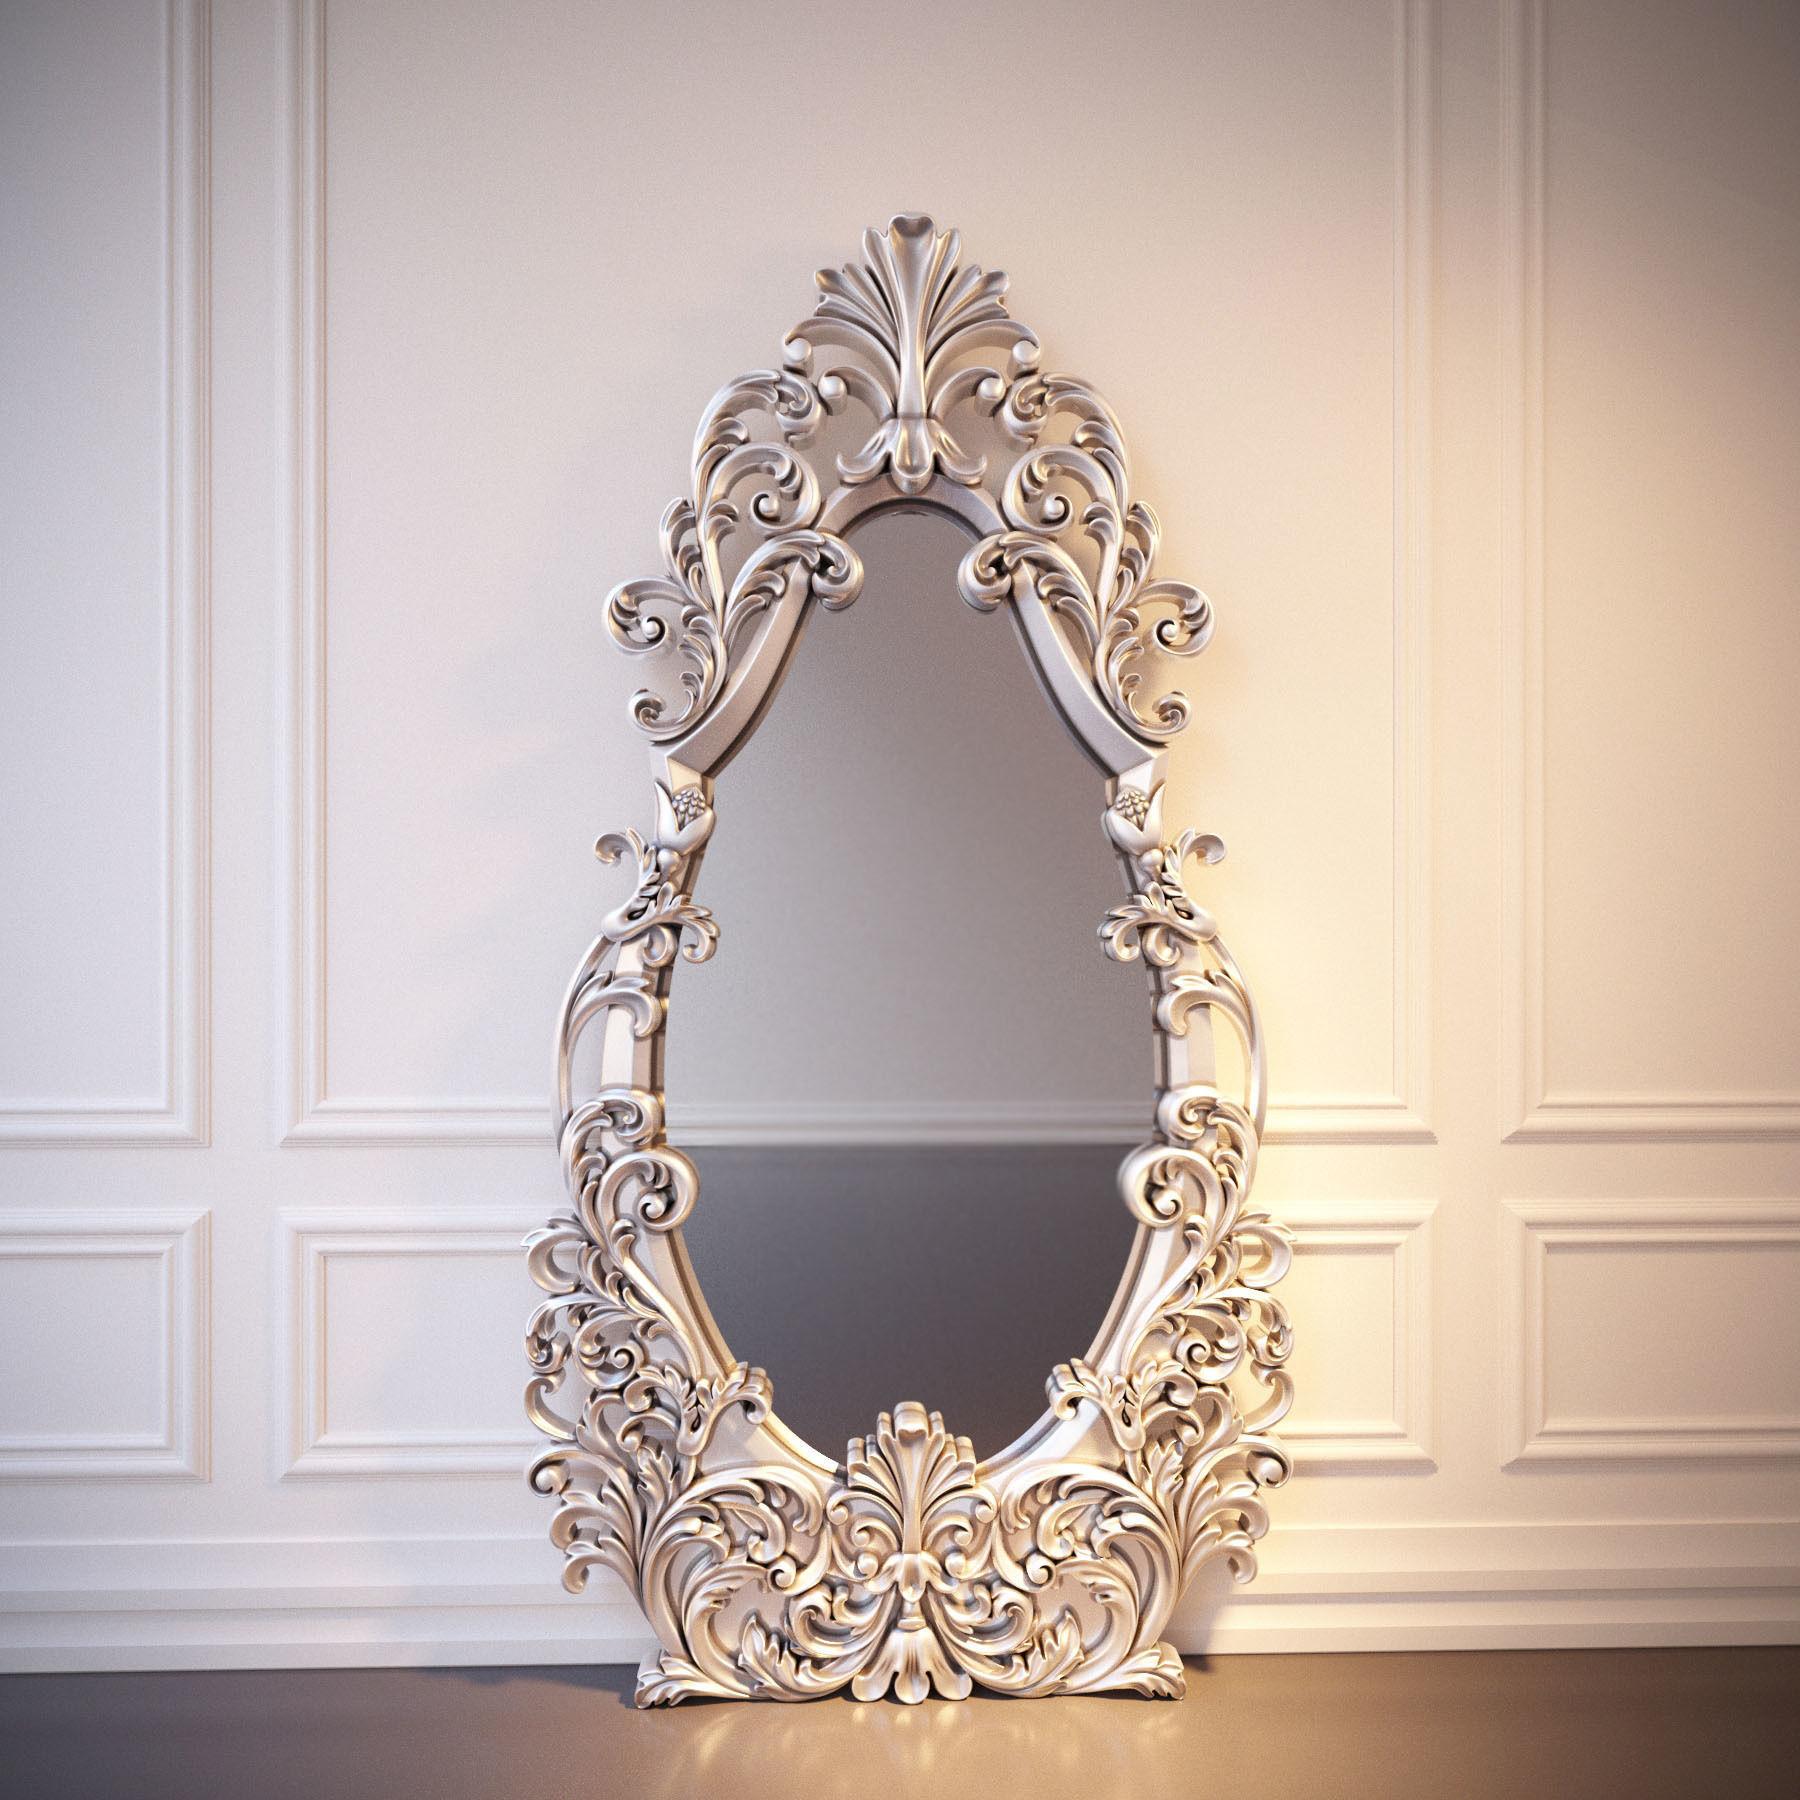 frame-mirror-3d-model-max-fbx-stl.jpg , archival pigment print, 2018